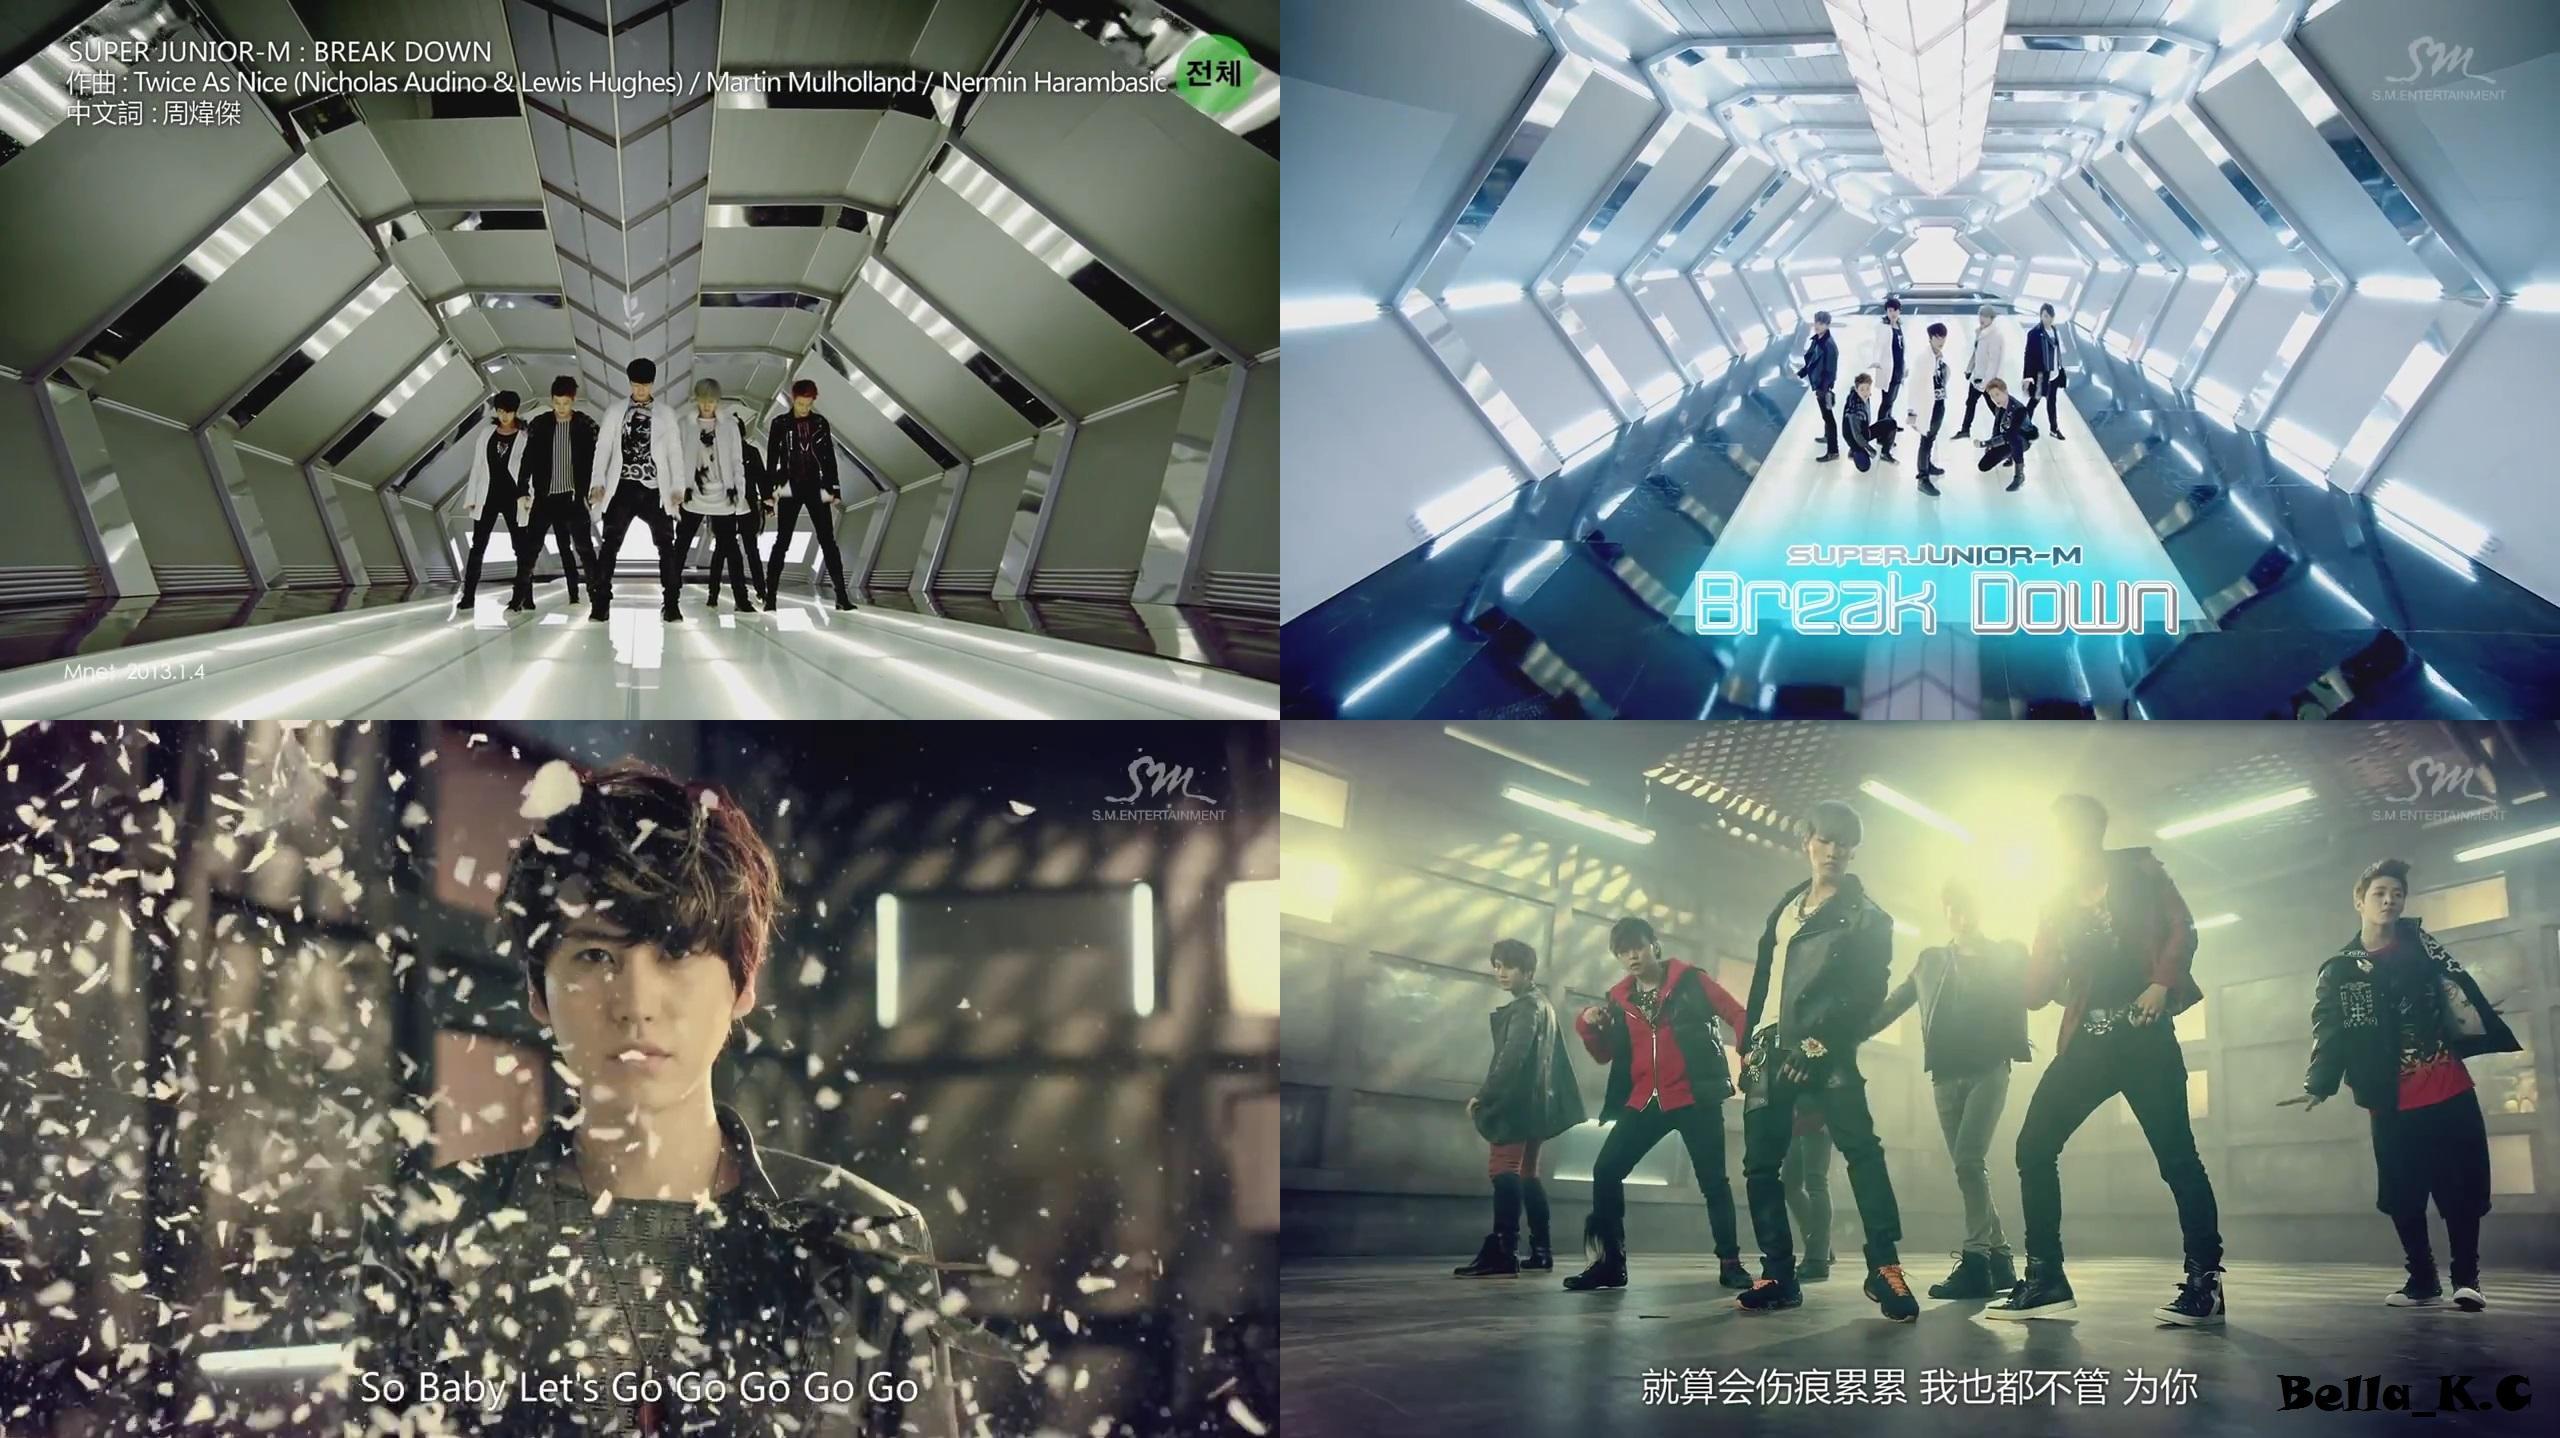 http://s7.picofile.com/file/8238204892/Super_Junior_M_BREAK_DOWN_Music_Video_By_Bella_K_C_05_55_16_.JPG